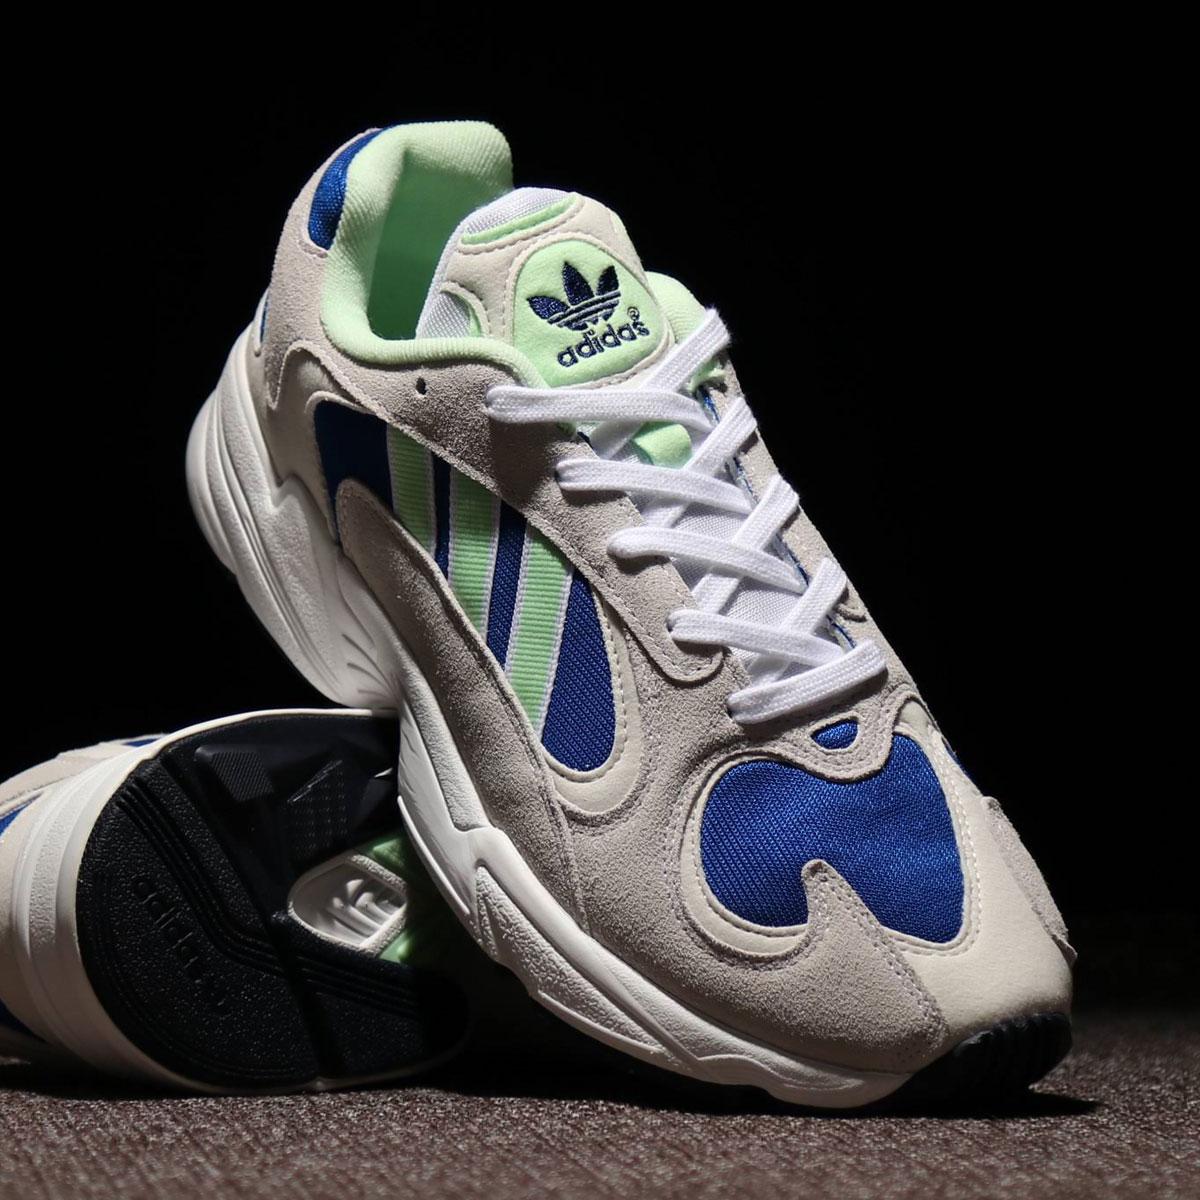 adidas Originals YUNG-1(アディダスオリジナルス ヤングワン)RUNNING WHITE/GLOW GREEN/COLLEGE ROYAL【メンズ レディース スニーカー】19FW-I